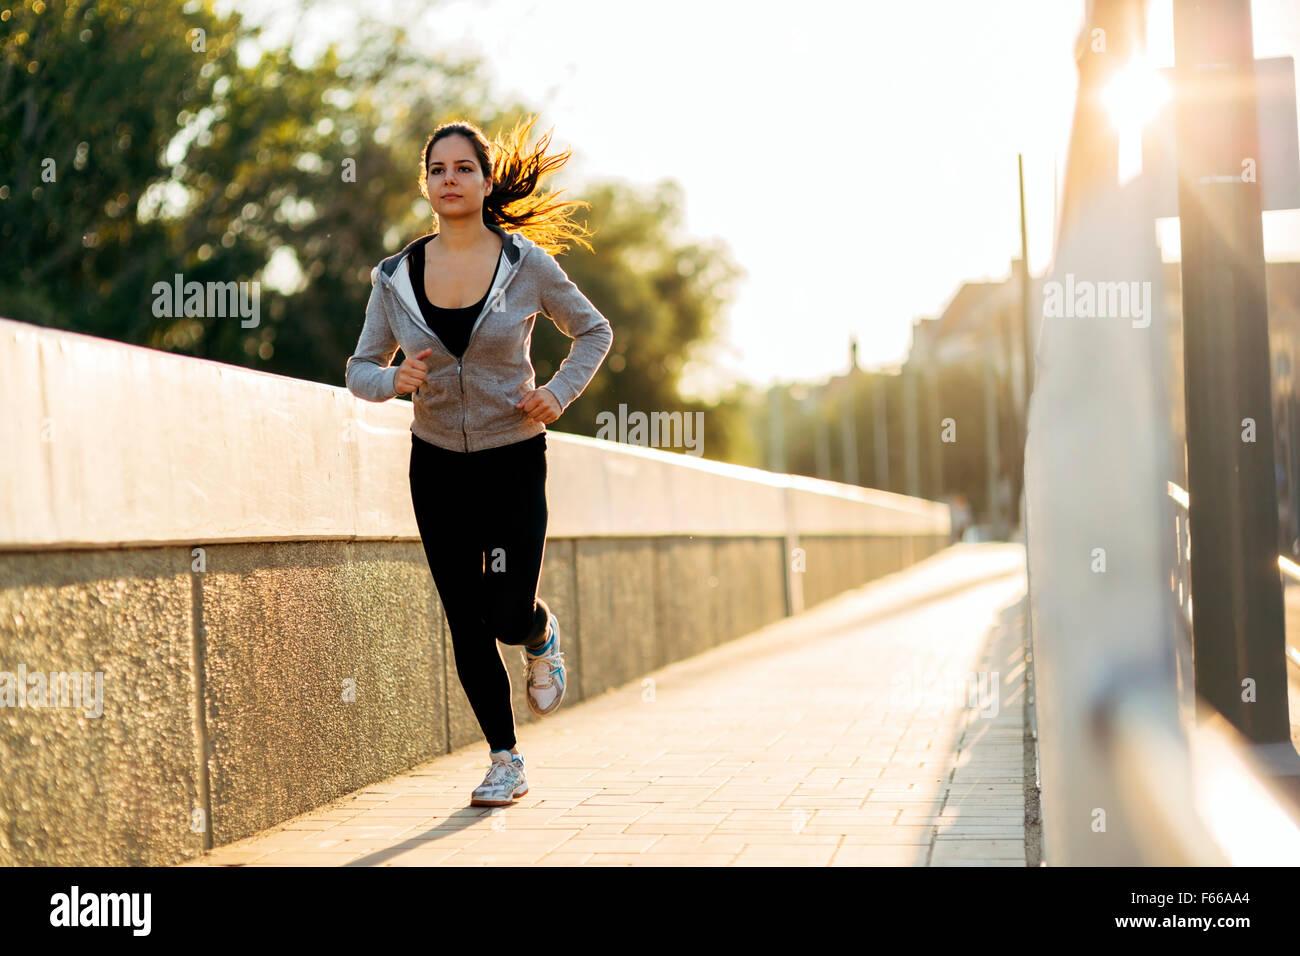 Belle femme jogging en ville et garder son corps en forme Photo Stock